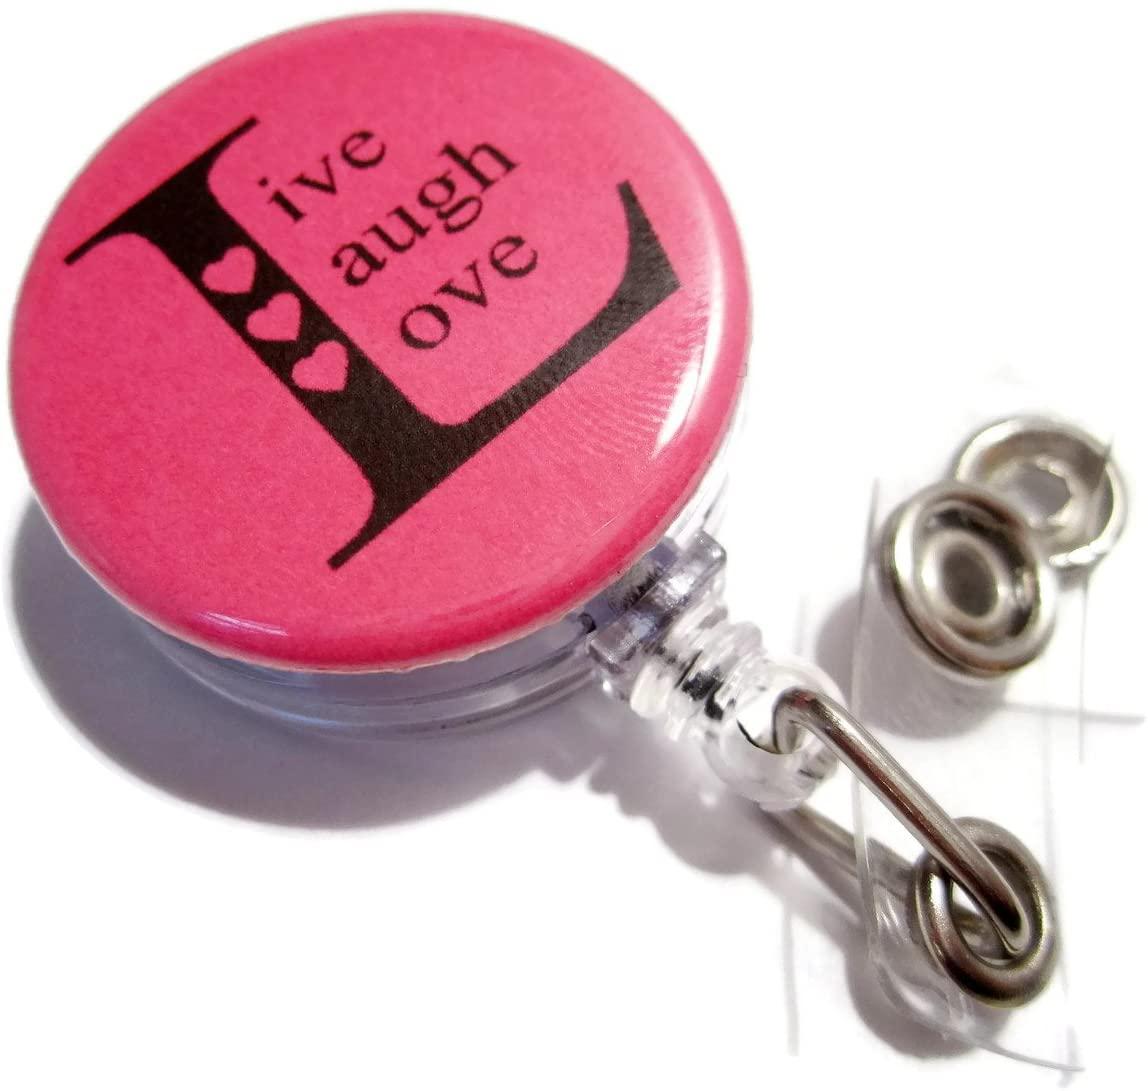 ATLanyards Live Laugh Love Badge Reel, Work Id Holder, Retractable Lanyard, Bright Pink 266